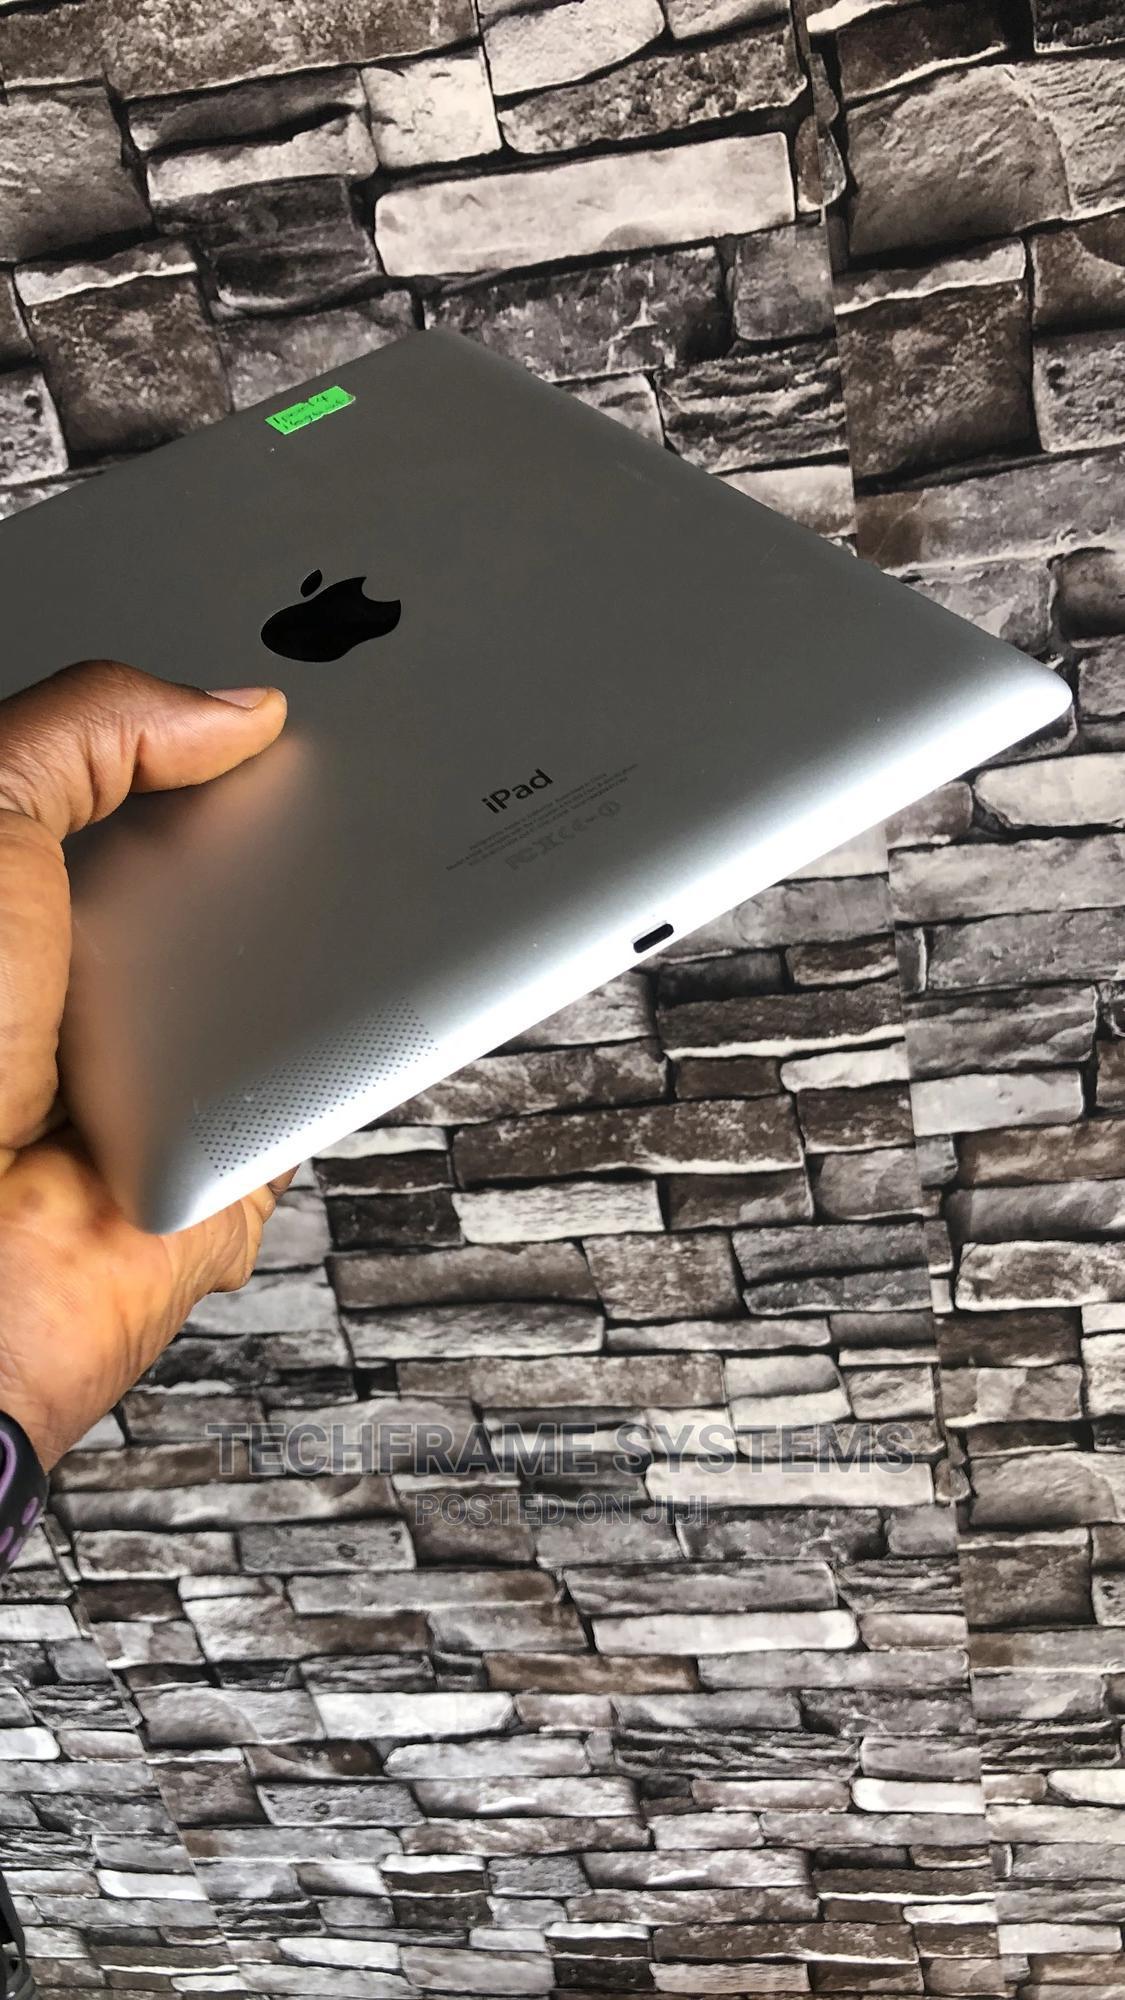 Apple iPad 4 Wi-Fi 16 GB Silver | Tablets for sale in Ikeja, Lagos State, Nigeria